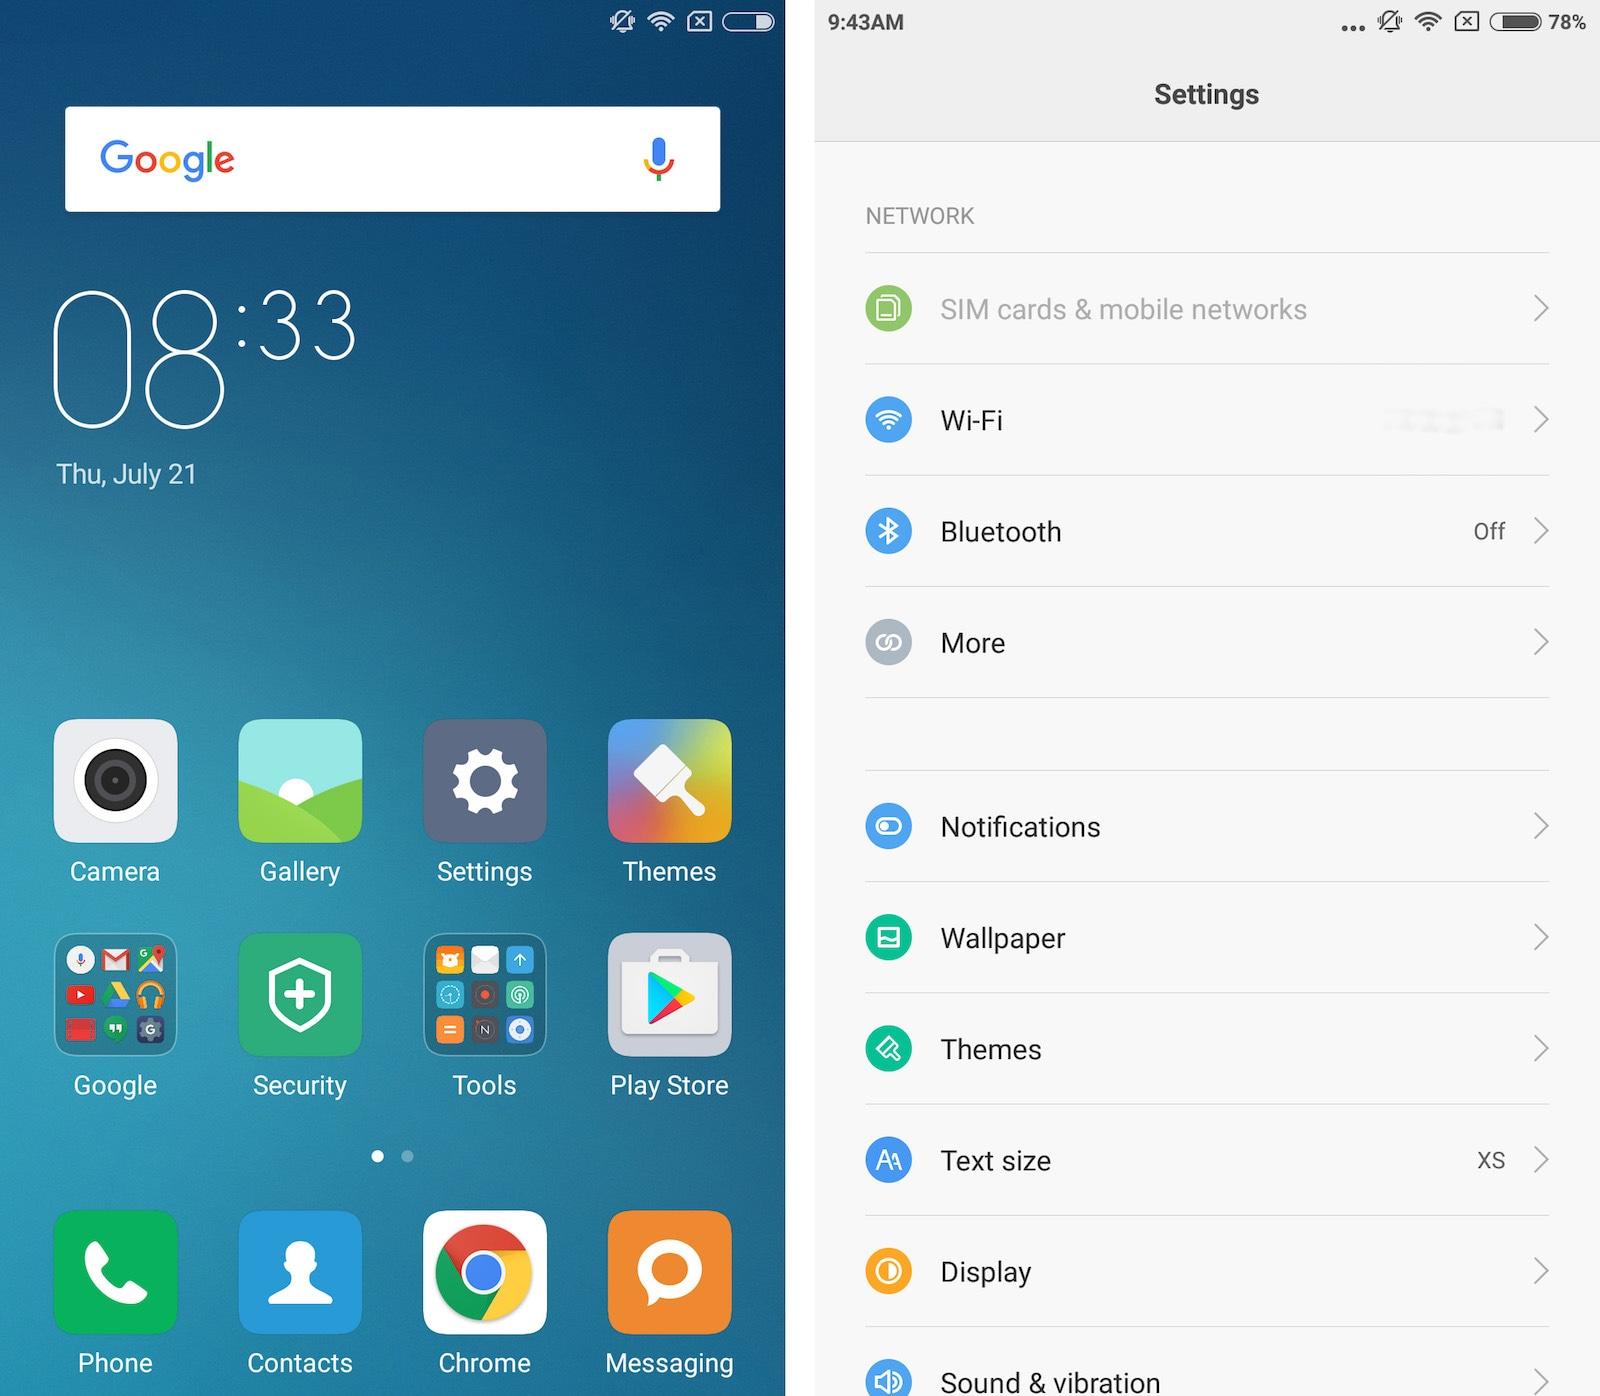 Xiaomi Redmi Note 3 Pro MIUI